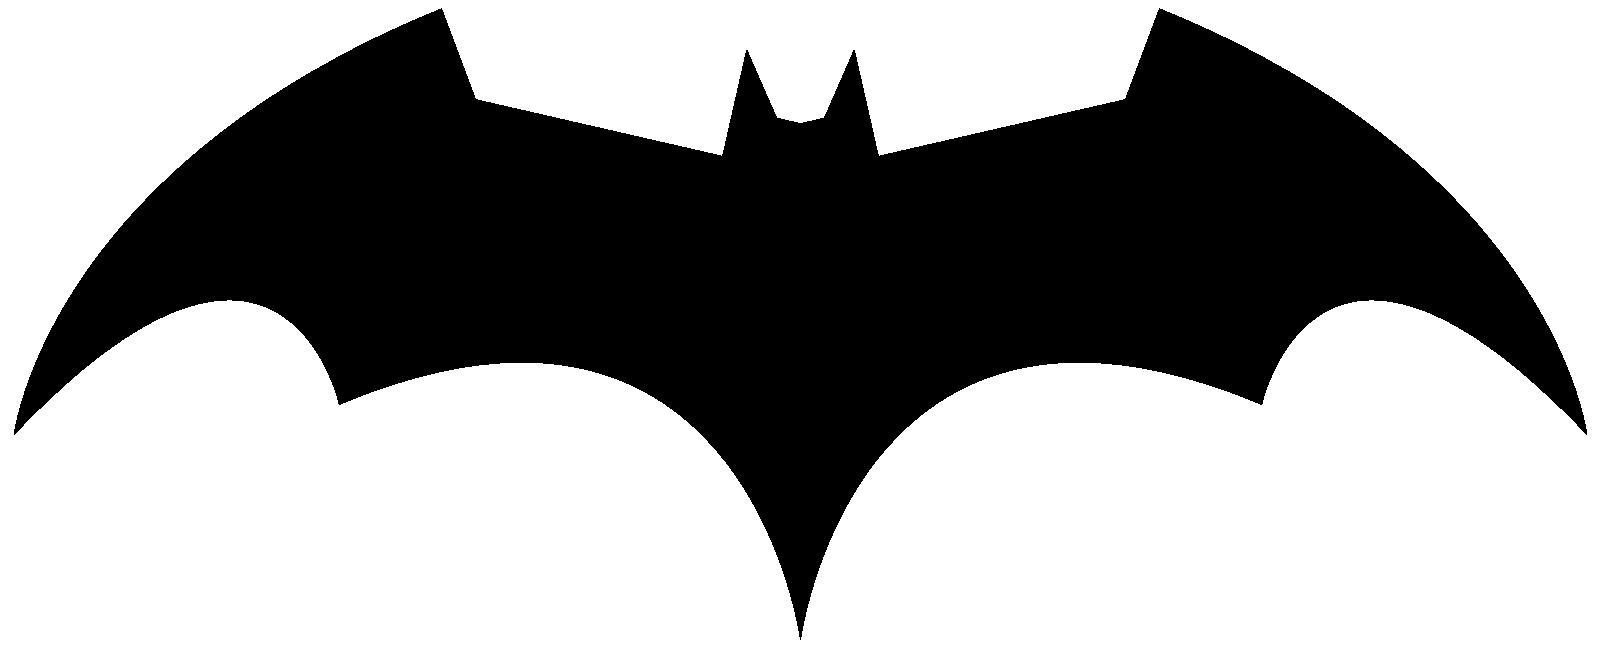 Batman symbol batgirl. Logo large ideal cosplay